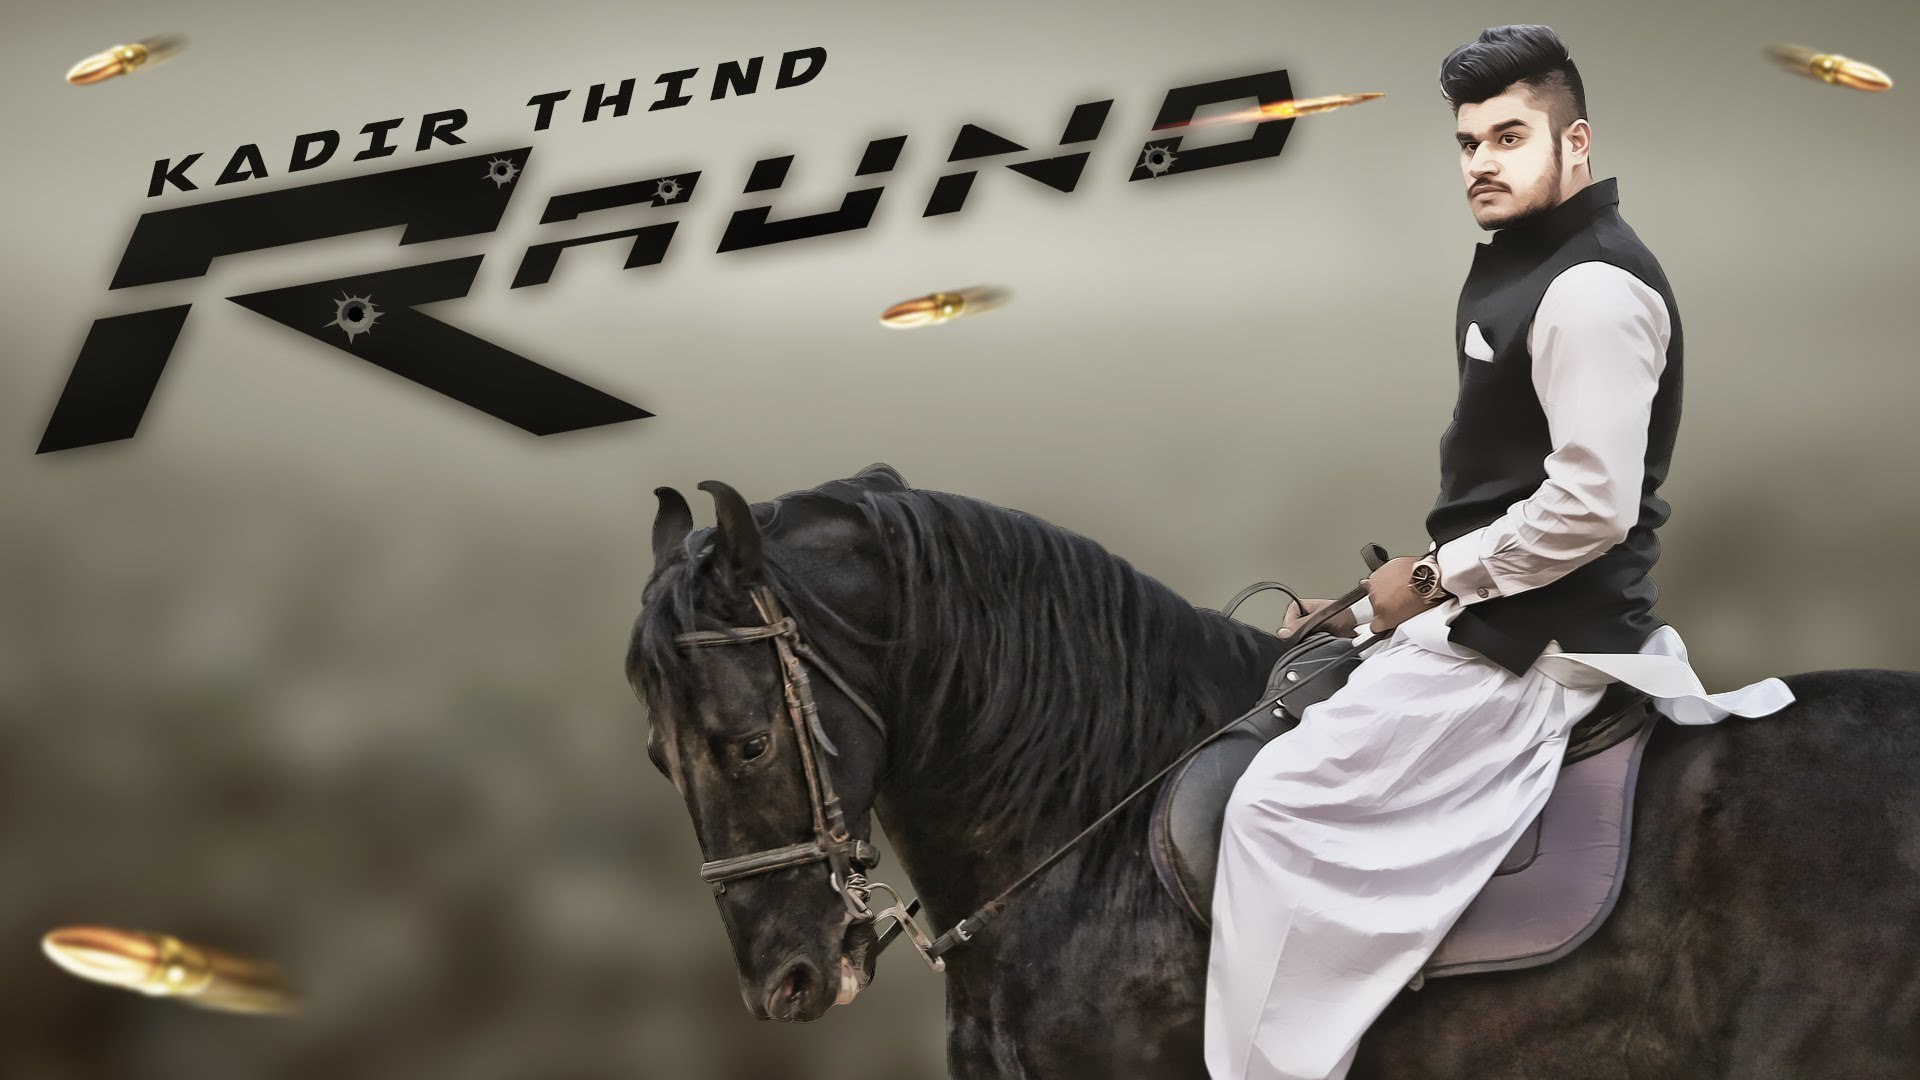 New Punjabi Songs 2015 | Raund | Kadir Thind | Latest Punjabi ...